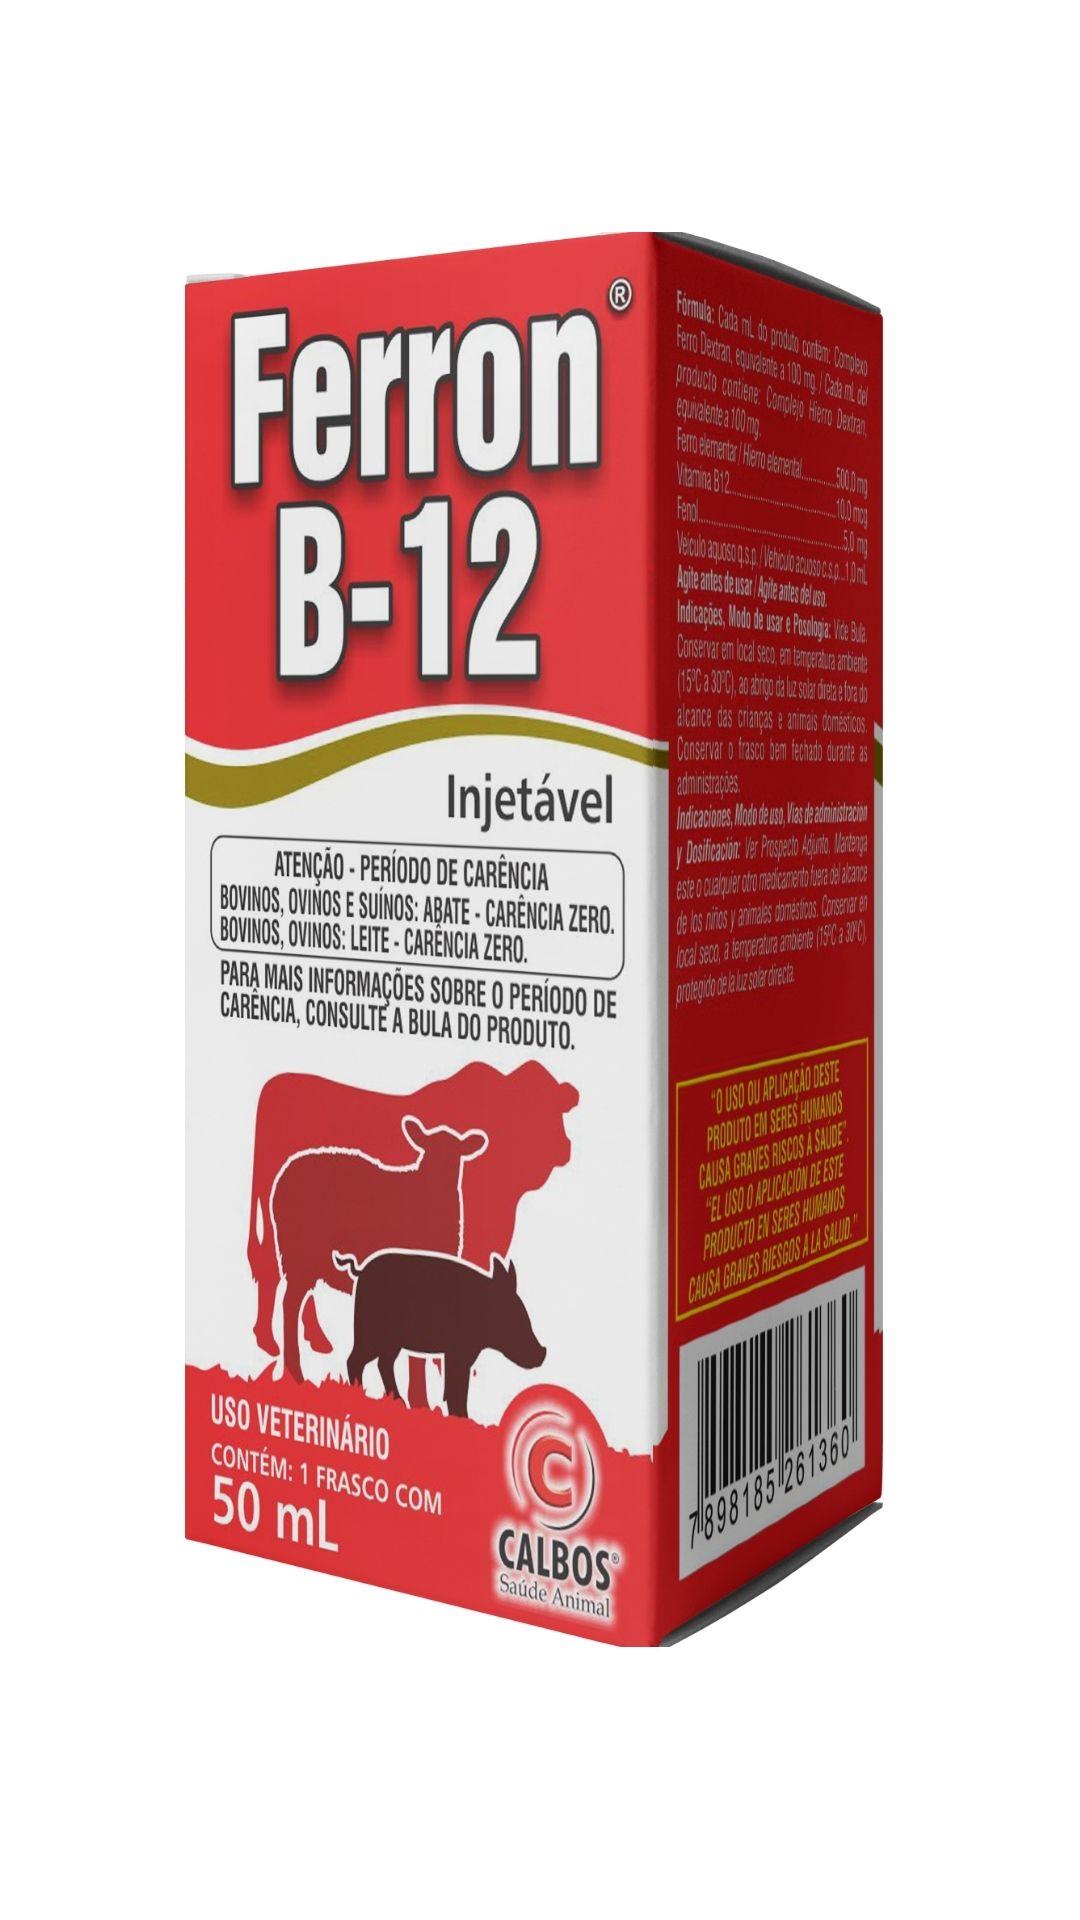 FERRON B12 50 ML